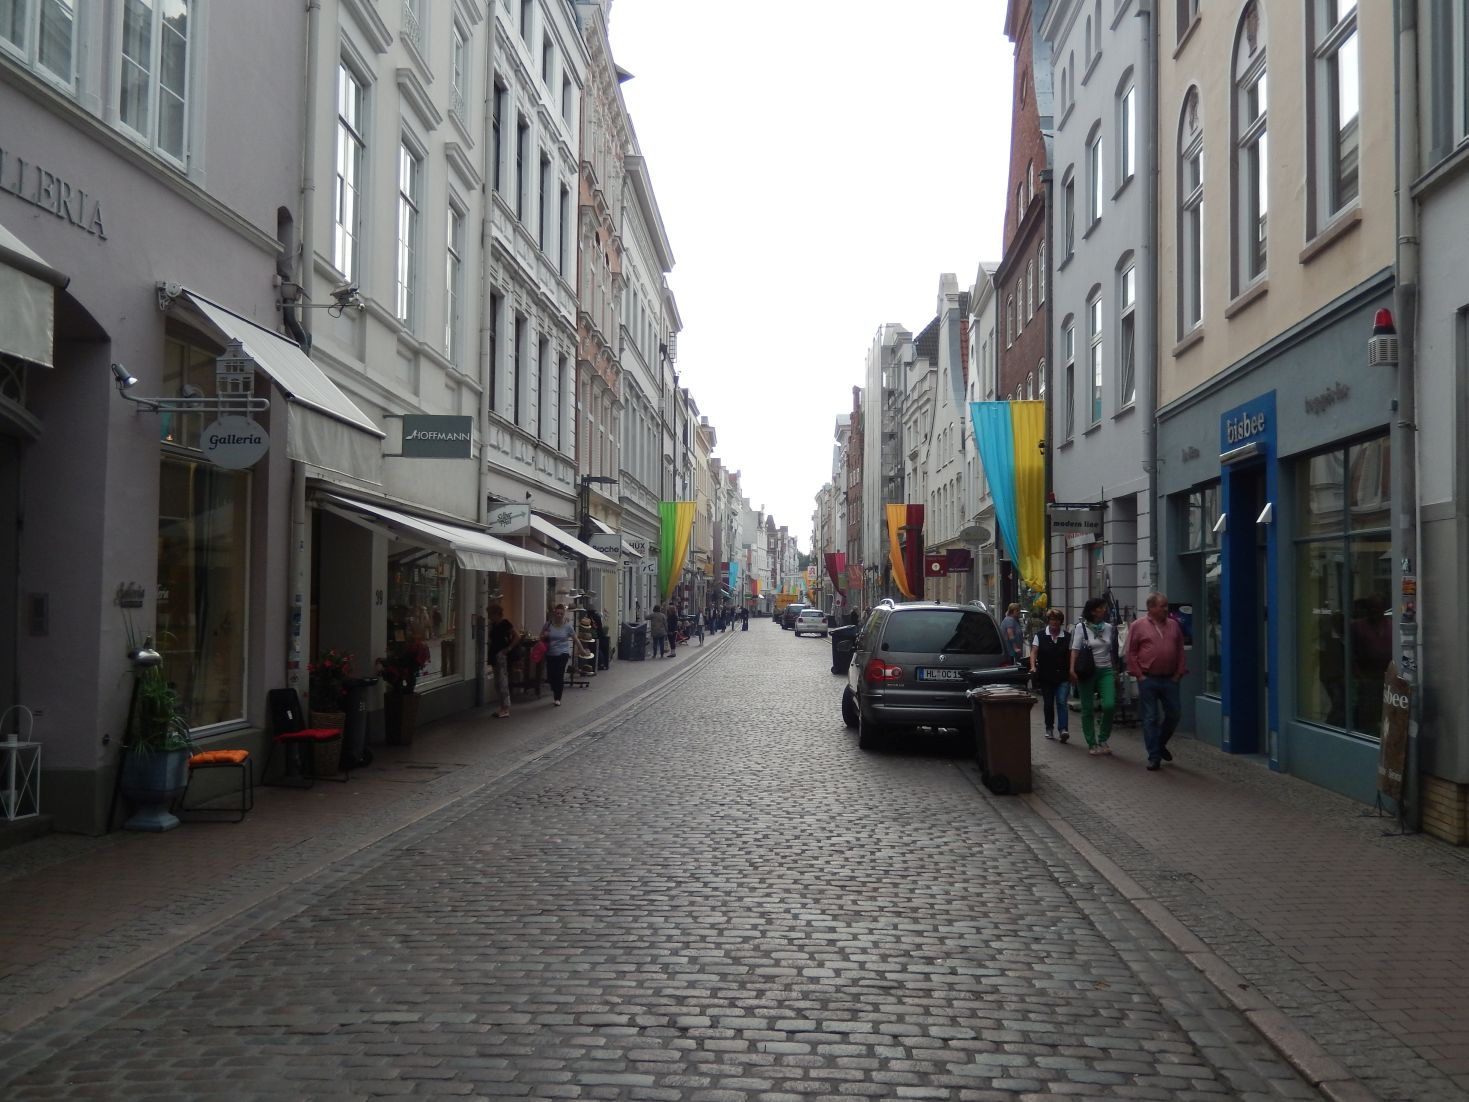 Tag 13 - Lübeck - Ostseeküstenradweg 2015 (Flensburg - Lübeck)